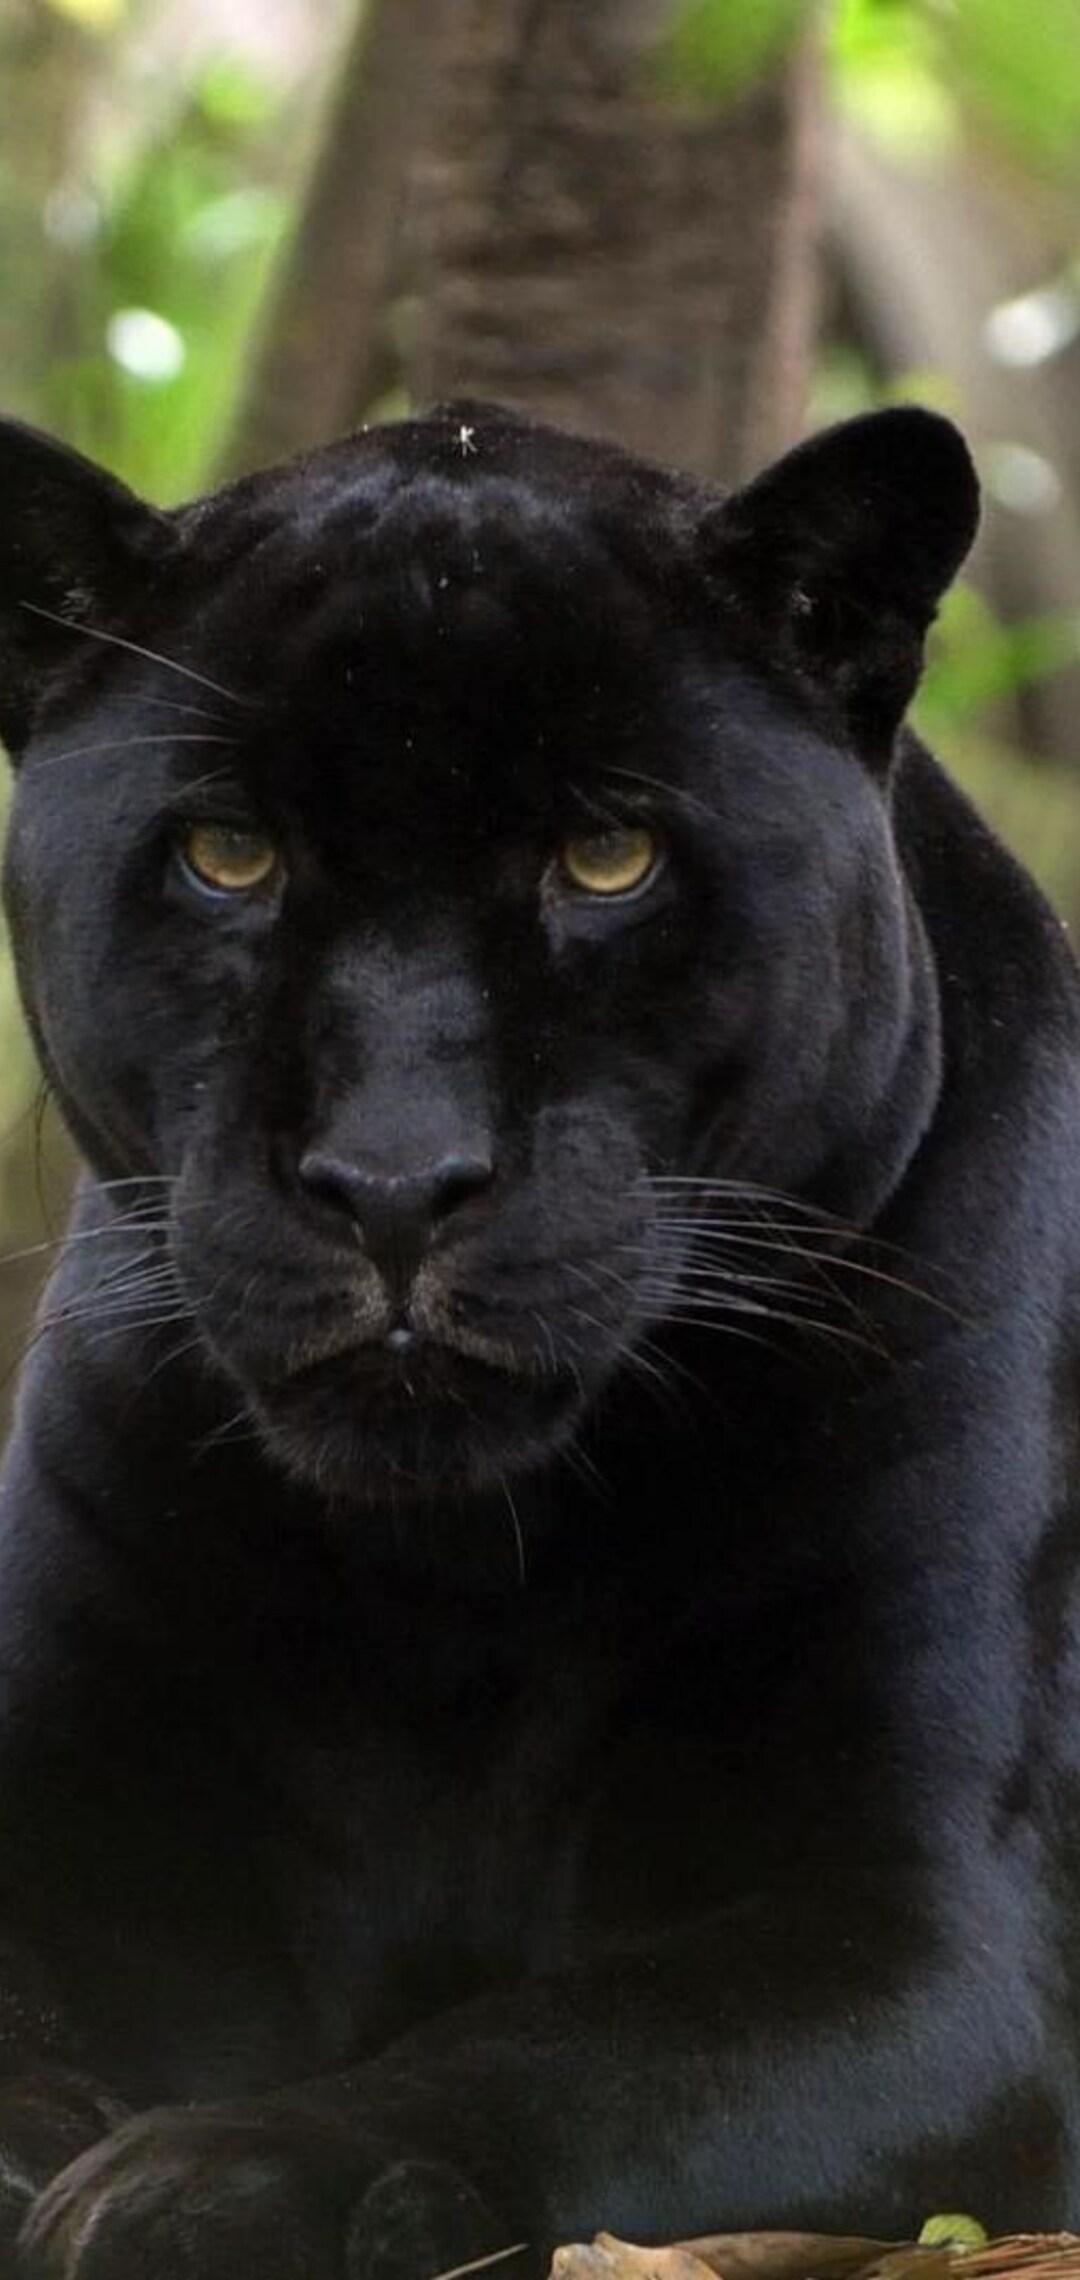 black-panther-2-hd.jpg